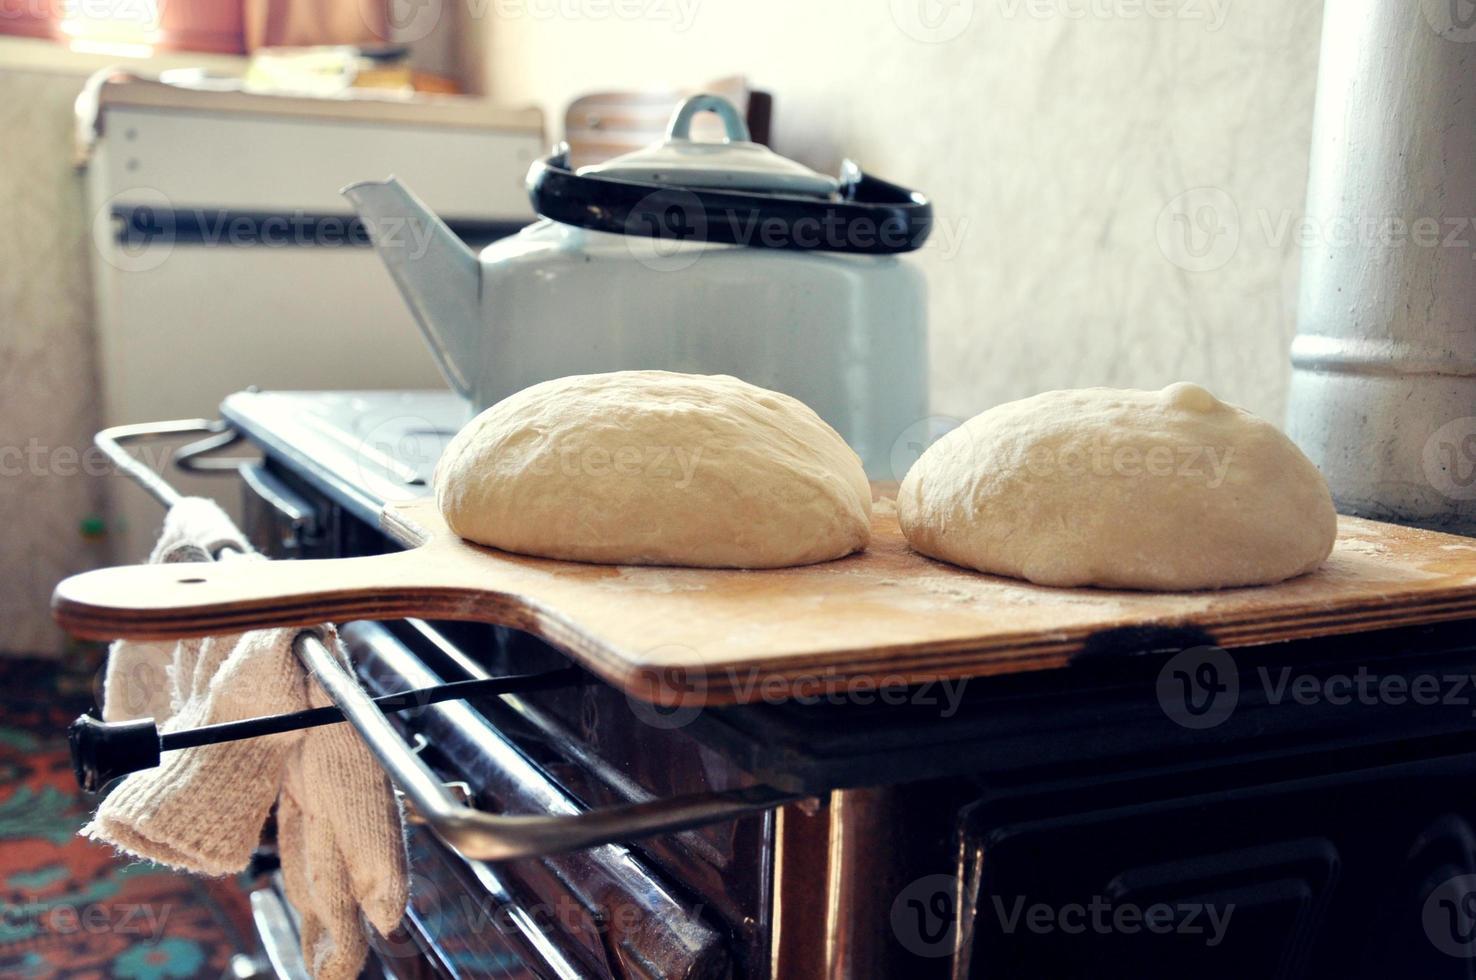 oma's zelfgebakken brood foto